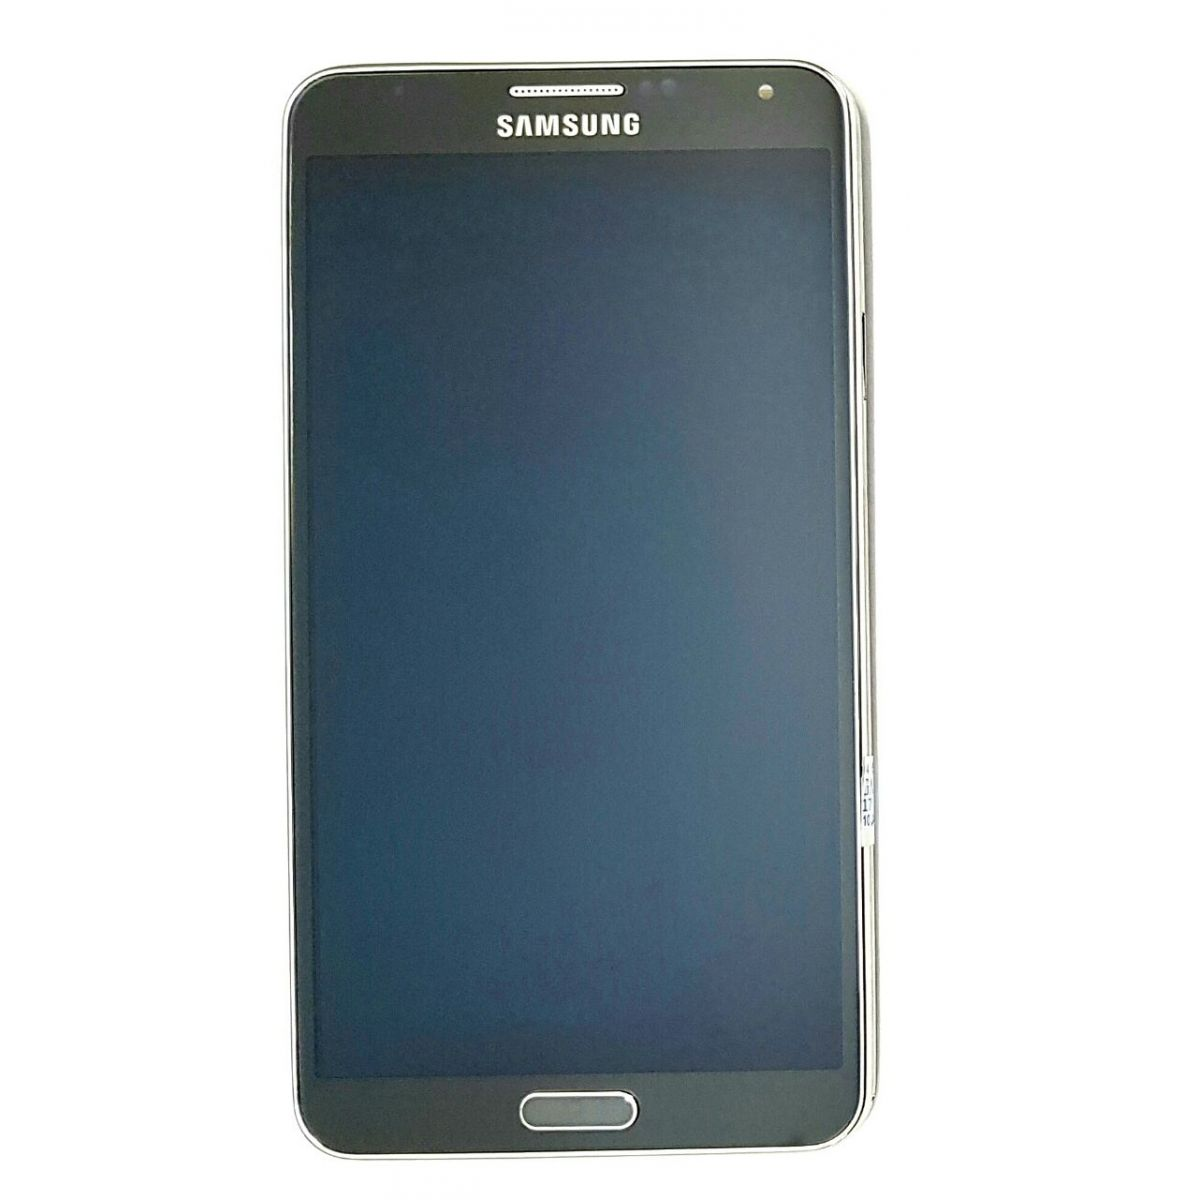 Display Frontal Samsung Galaxy Note 3 N9005 Preto Com Aro